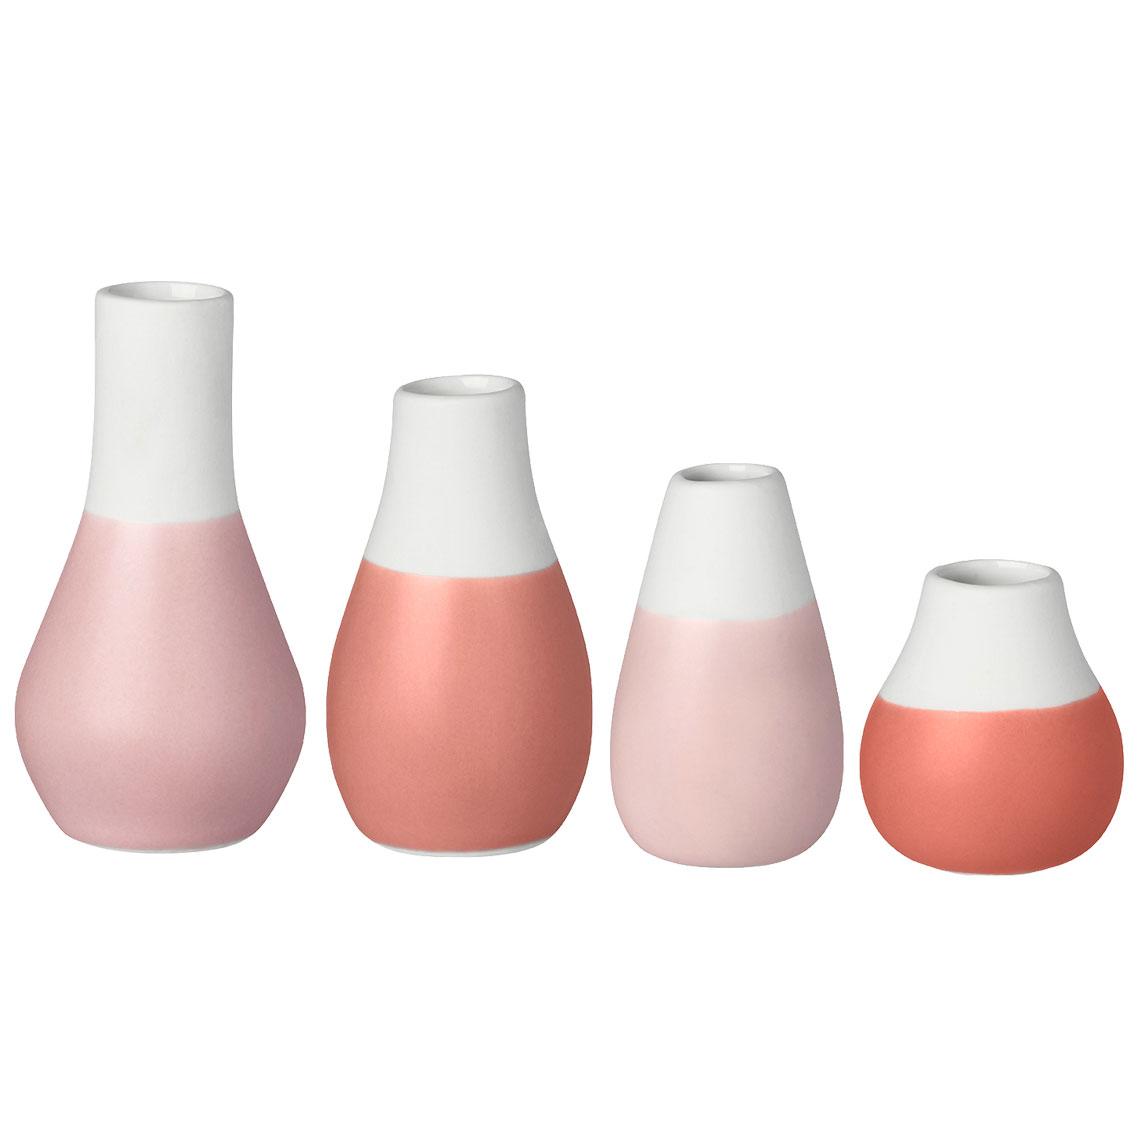 "Mini Vasen Pudertöne ""Set aus 4"" - räder"